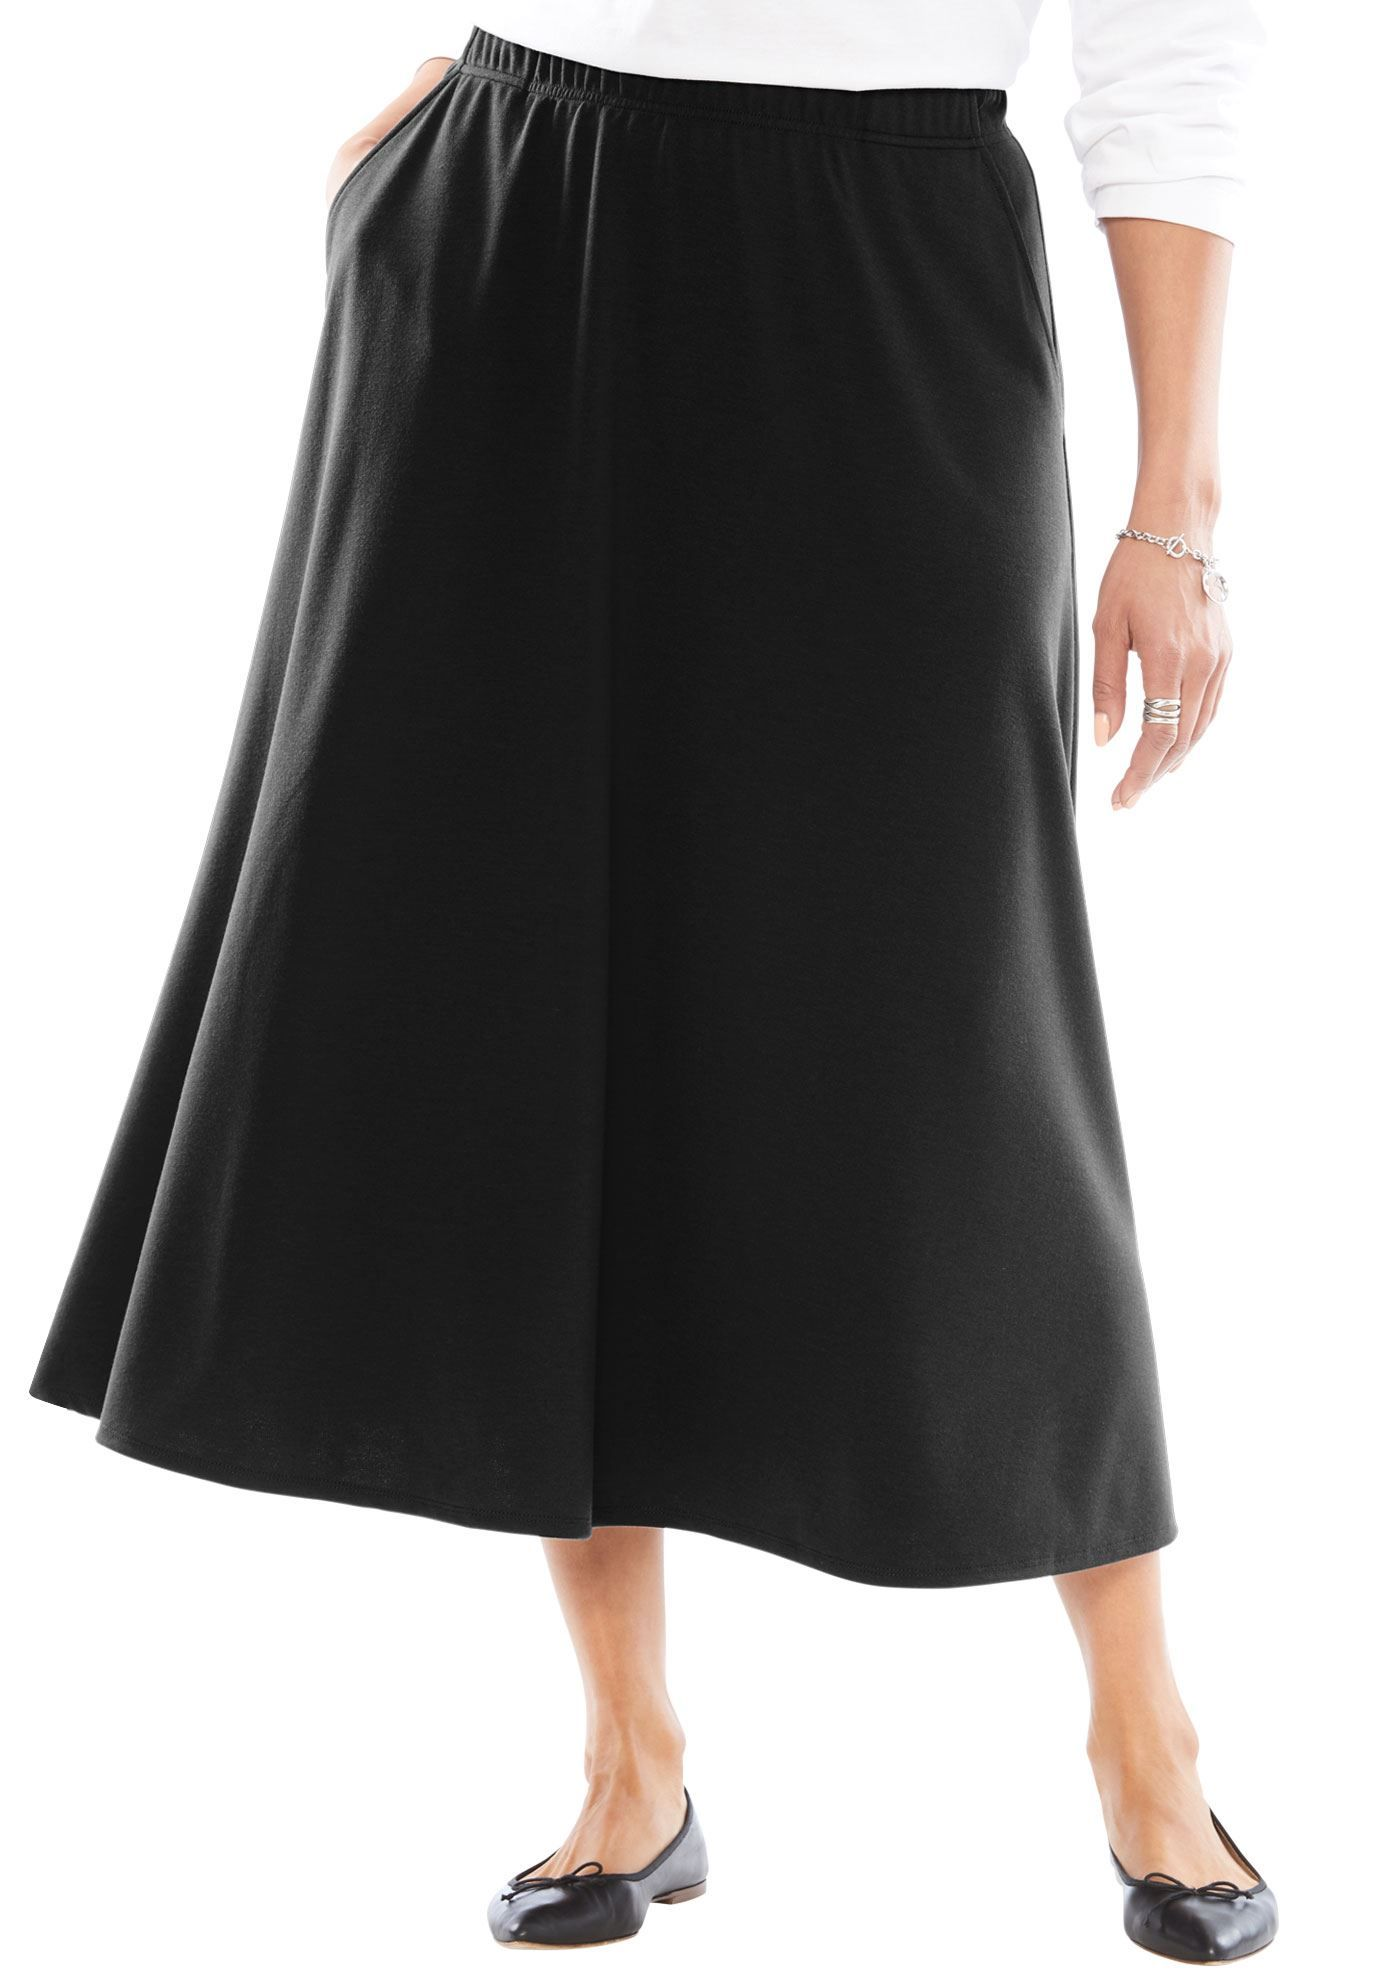 ff76d81b985 Petite A-Line Ponte Skirt - Women s Plus Size Clothing